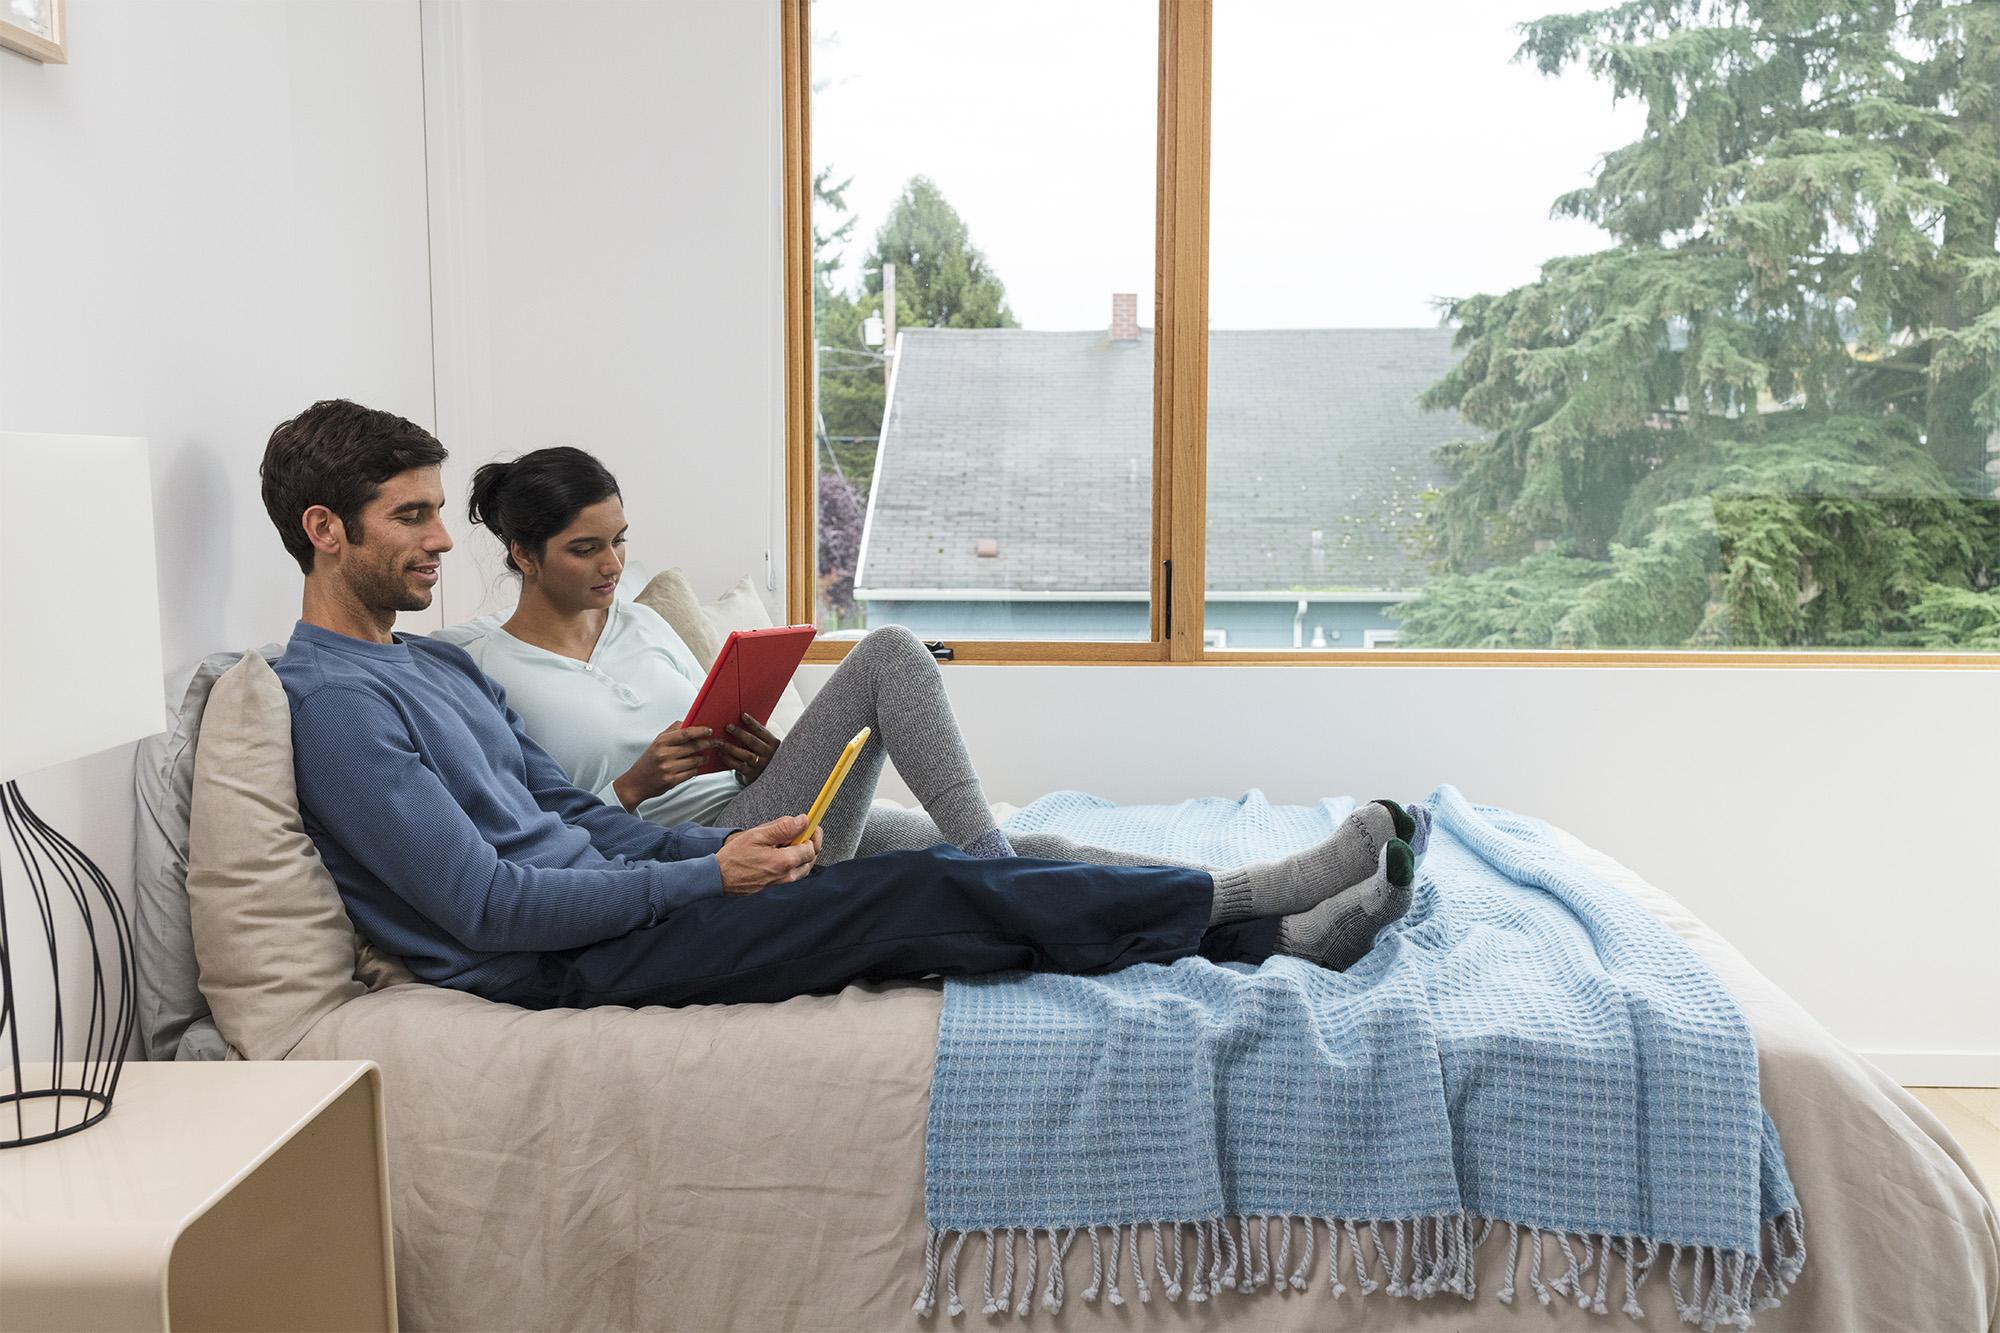 Suez_Bedroom_Holiday_Reading_1607_MAIN_V2_Before.jpg